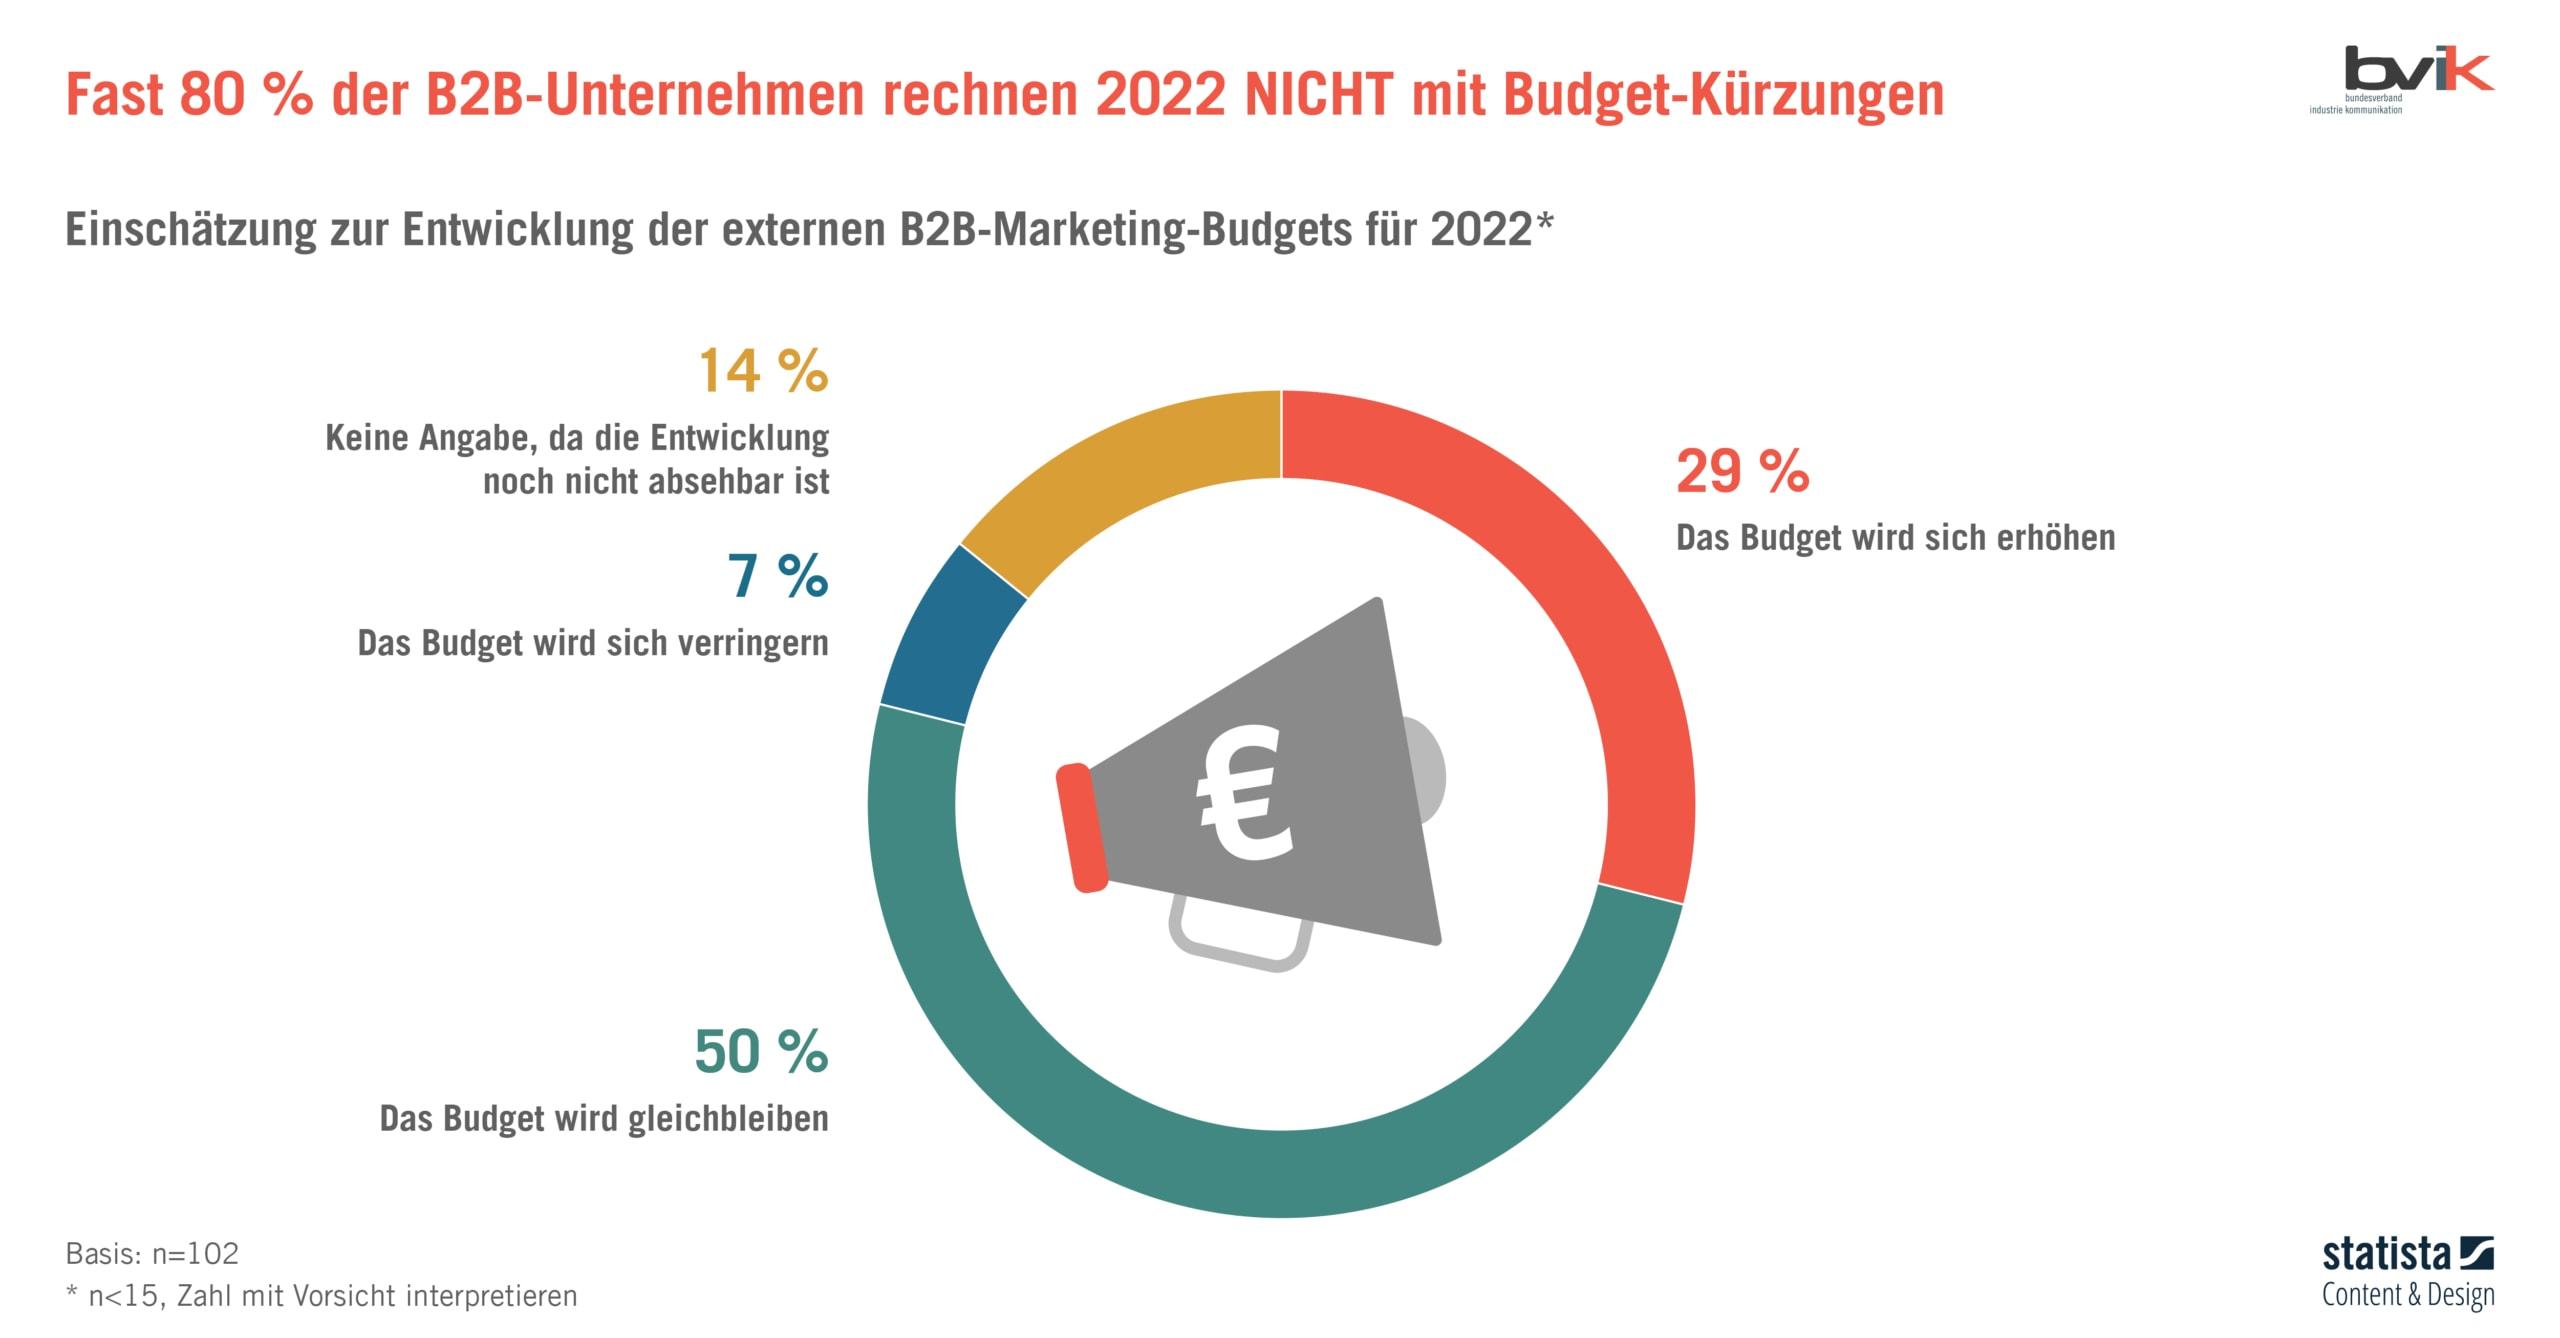 Entwicklung 2022 - B2B-Marketing-Budgets